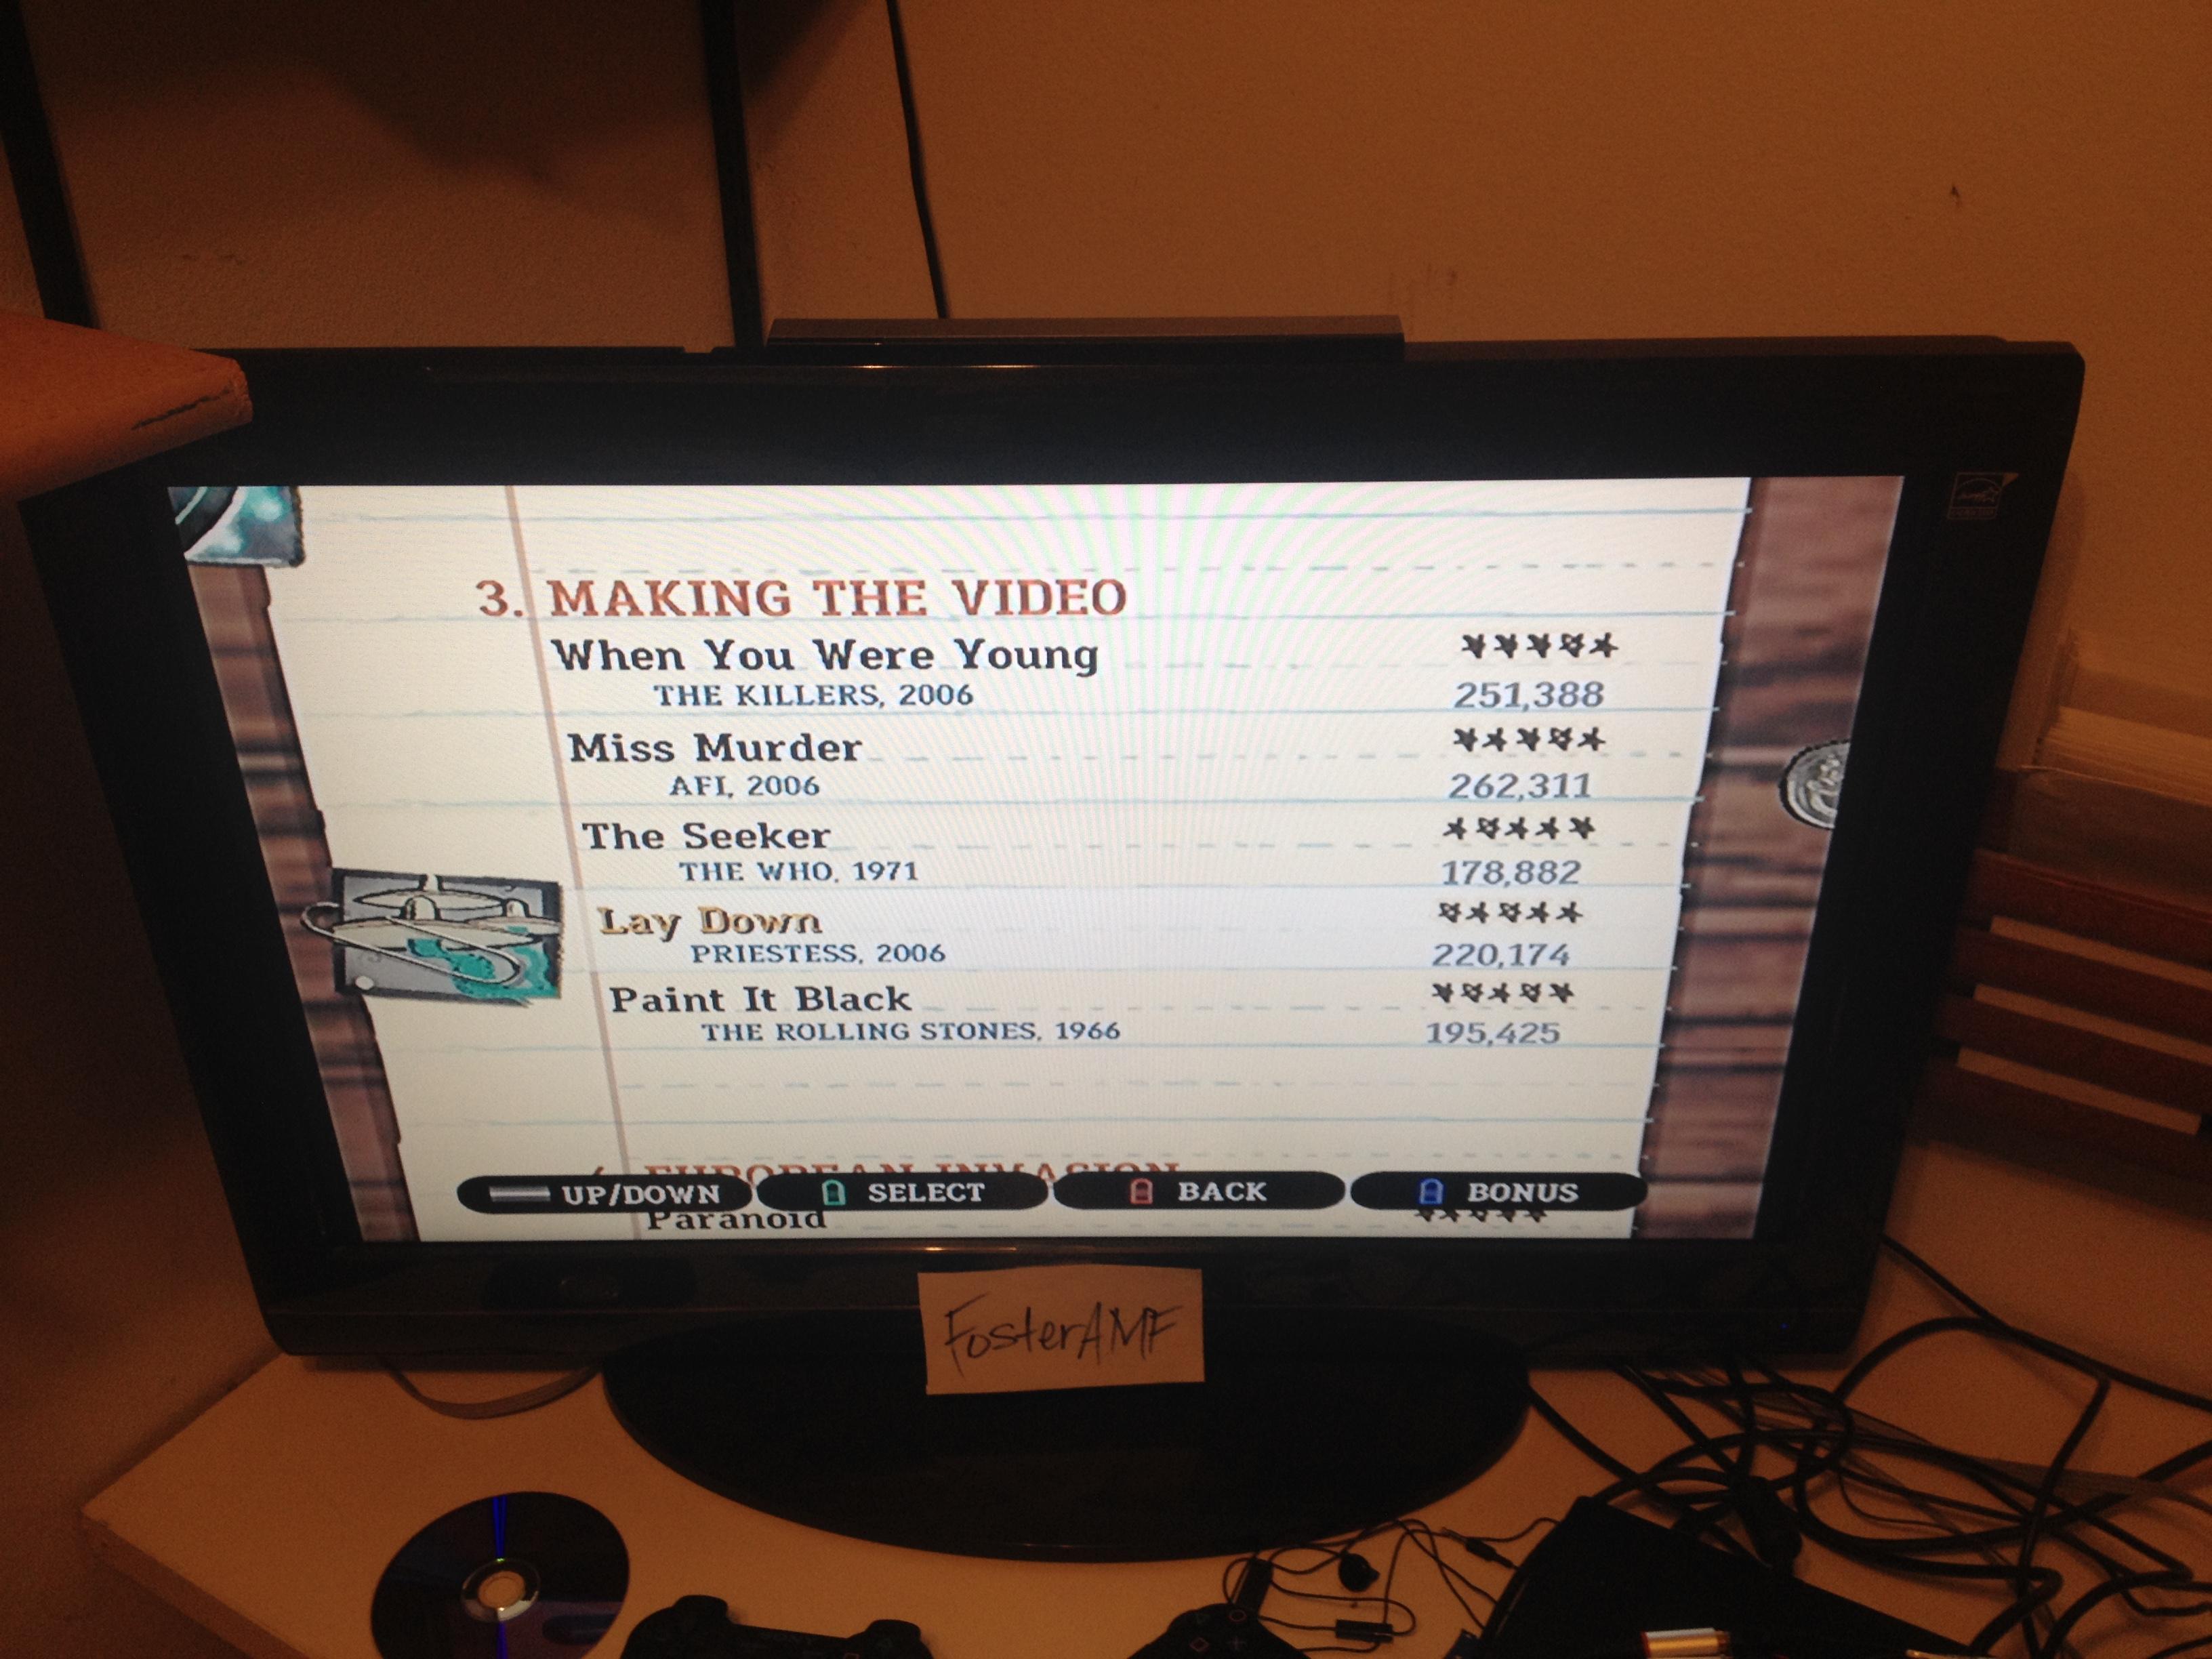 "FosterAMF: Guitar Hero III: Legends of Rock: ""The Seeker"" [Expert] (Wii) 178,882 points on 2015-04-19 01:05:51"